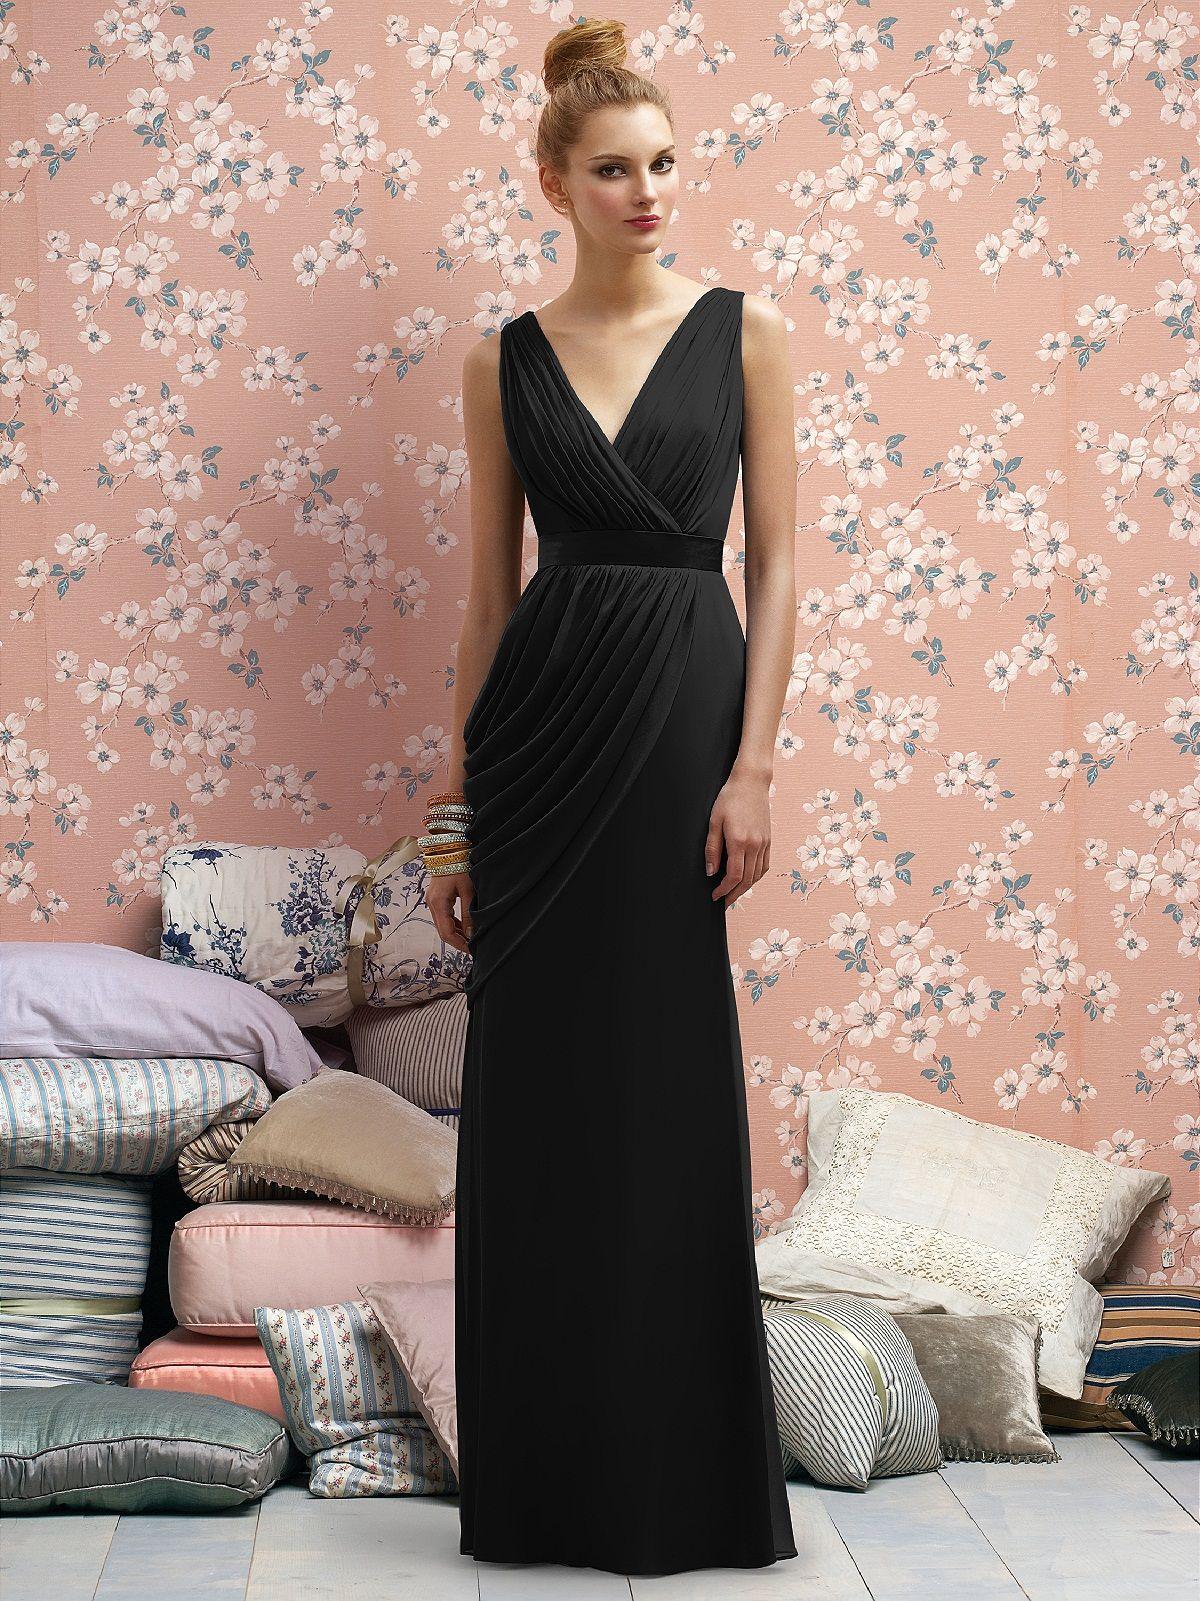 Lela rose bridesmaids style lr174 girls black dress black lela rose bridesmaids style lr174 dresses for bridesmaidschiffon bridesmaid dressesblack ombrellifo Gallery